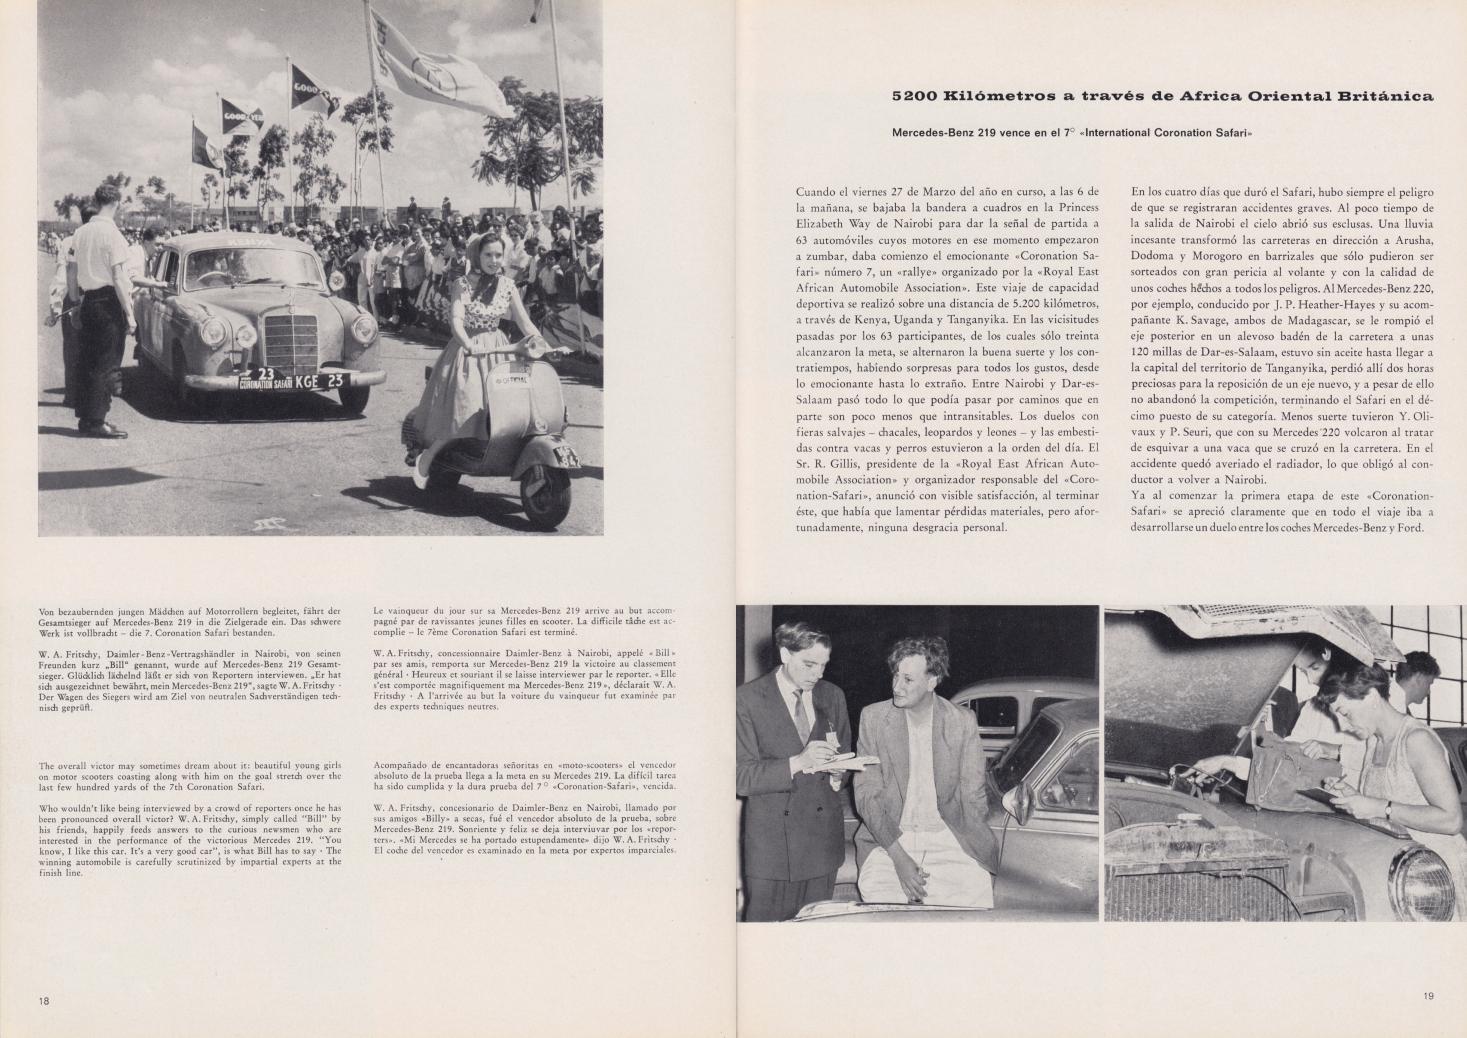 (REVISTA): Periódico In aller welt n.º 33 - Mercedes-Benz no mundo - 1959 - multilingue 010